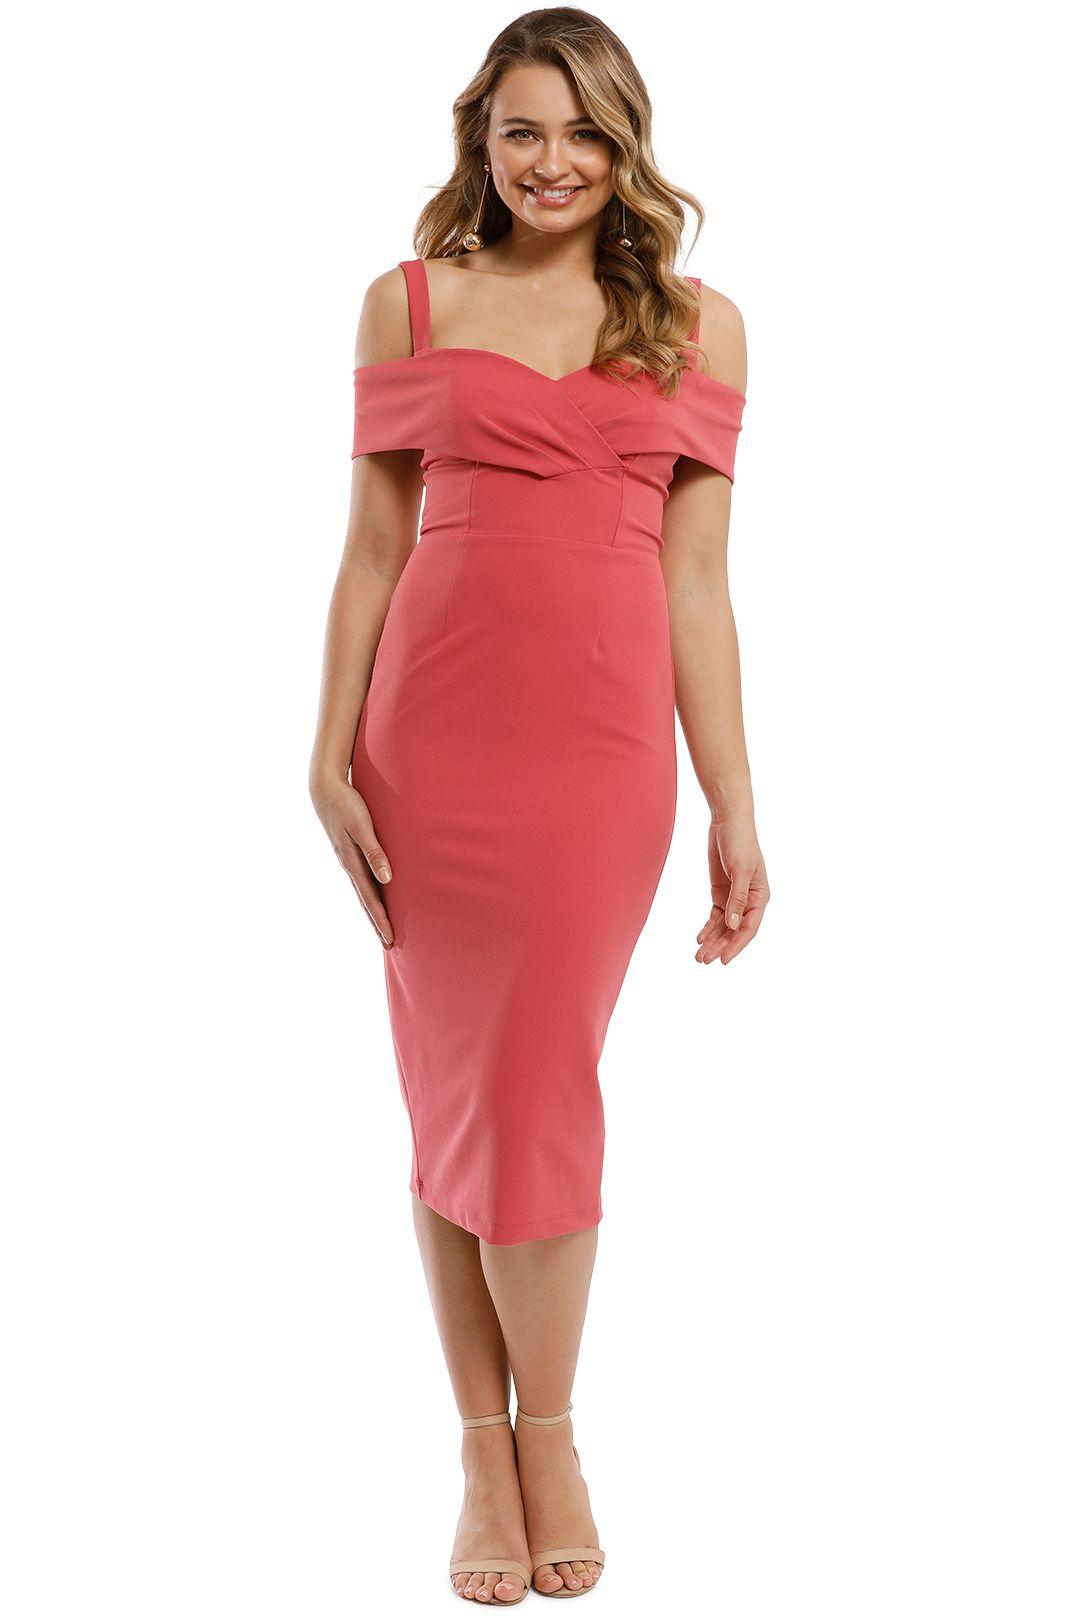 Pasduchas - Riviera Midi Dress - Watermelon - Front